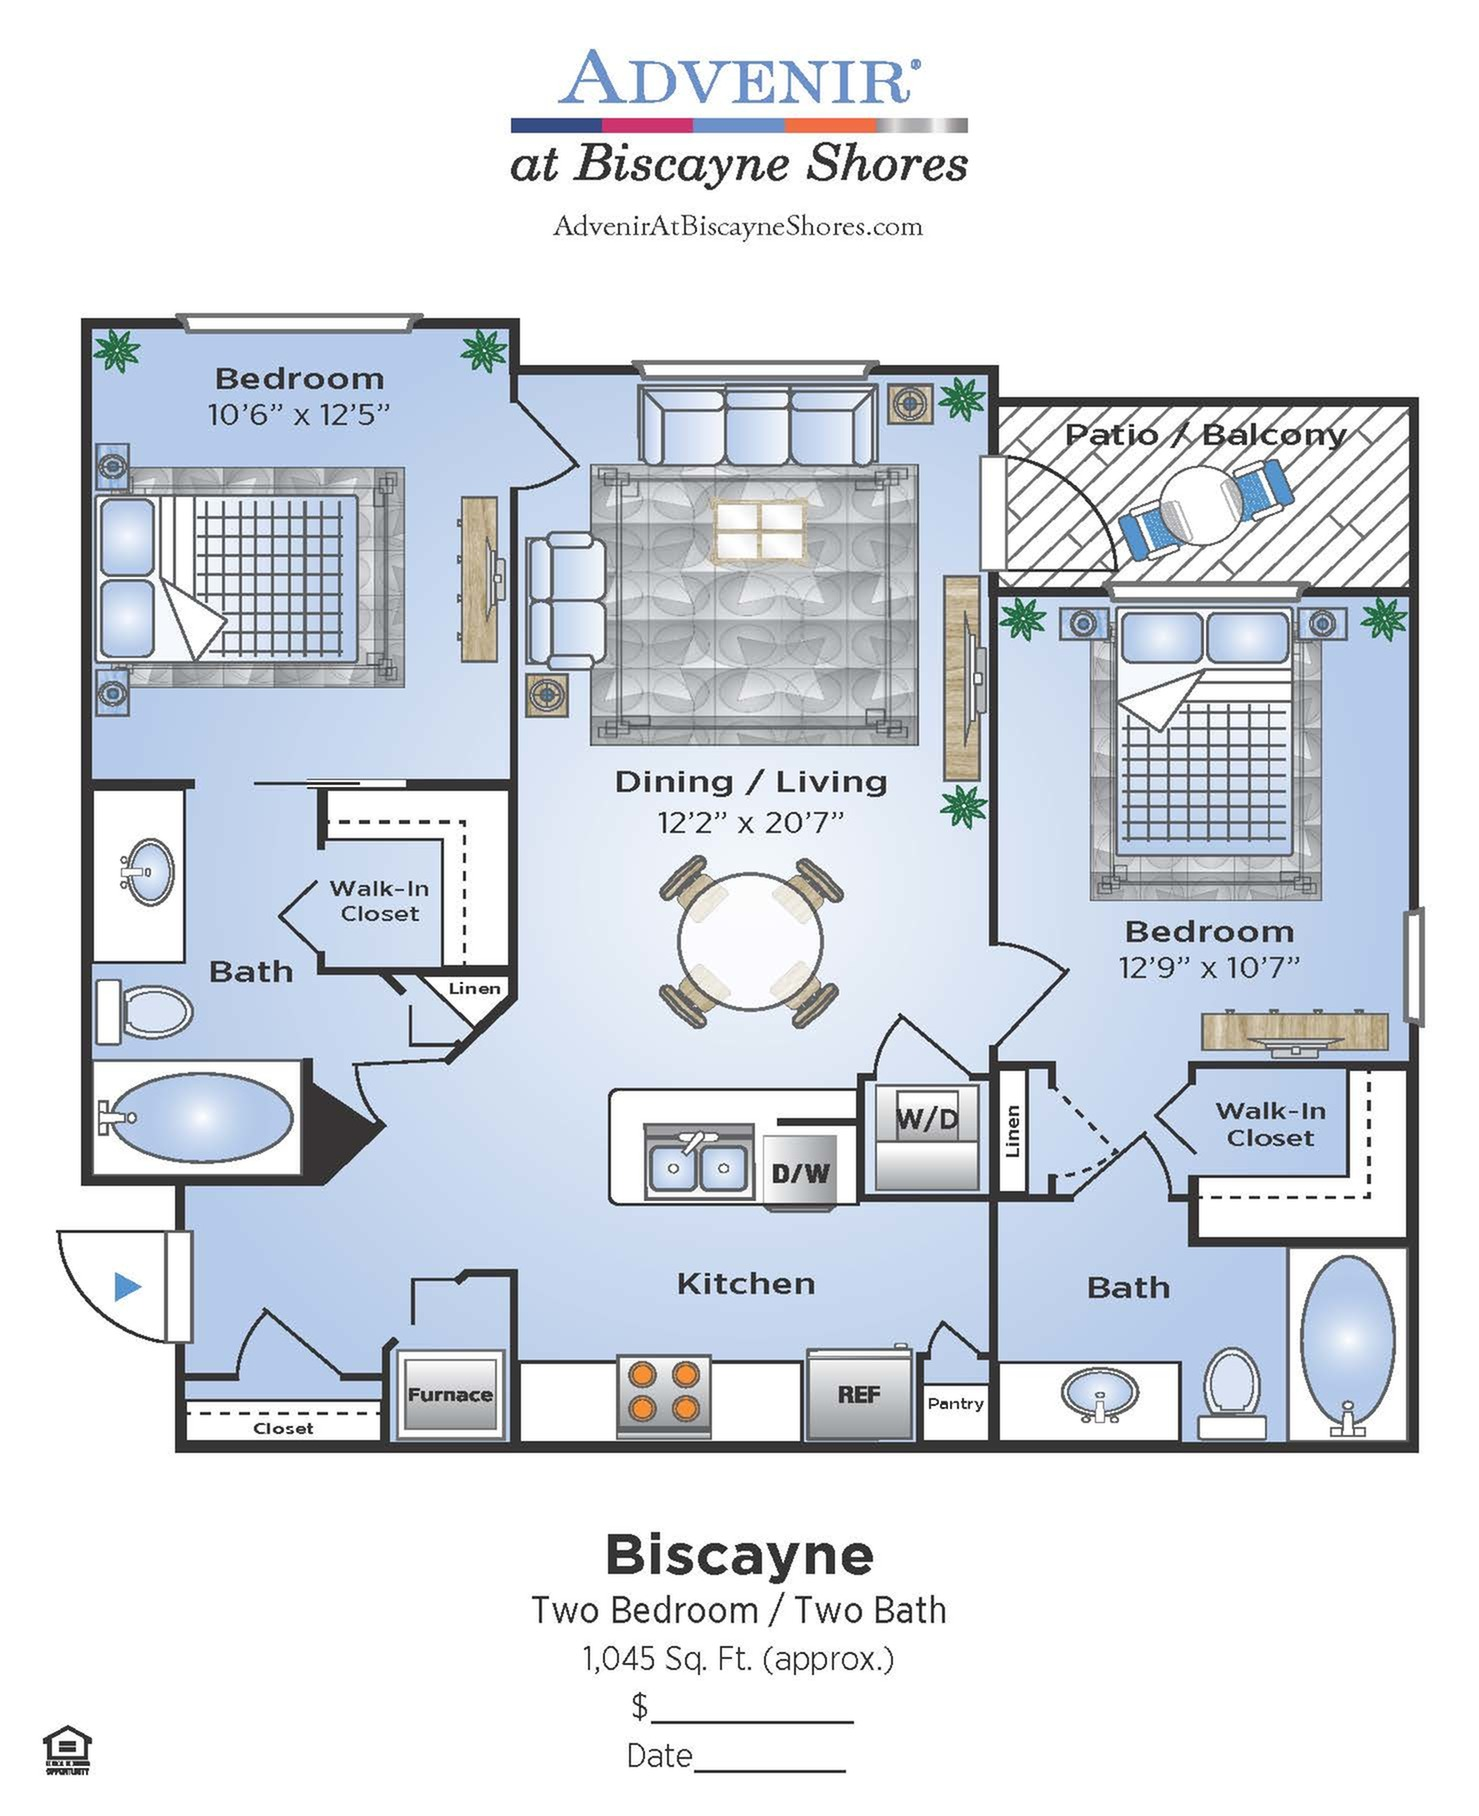 2 Bedroom Floor Plan | Miami Biscayne Apartments | Advenir at Biscayne Shores